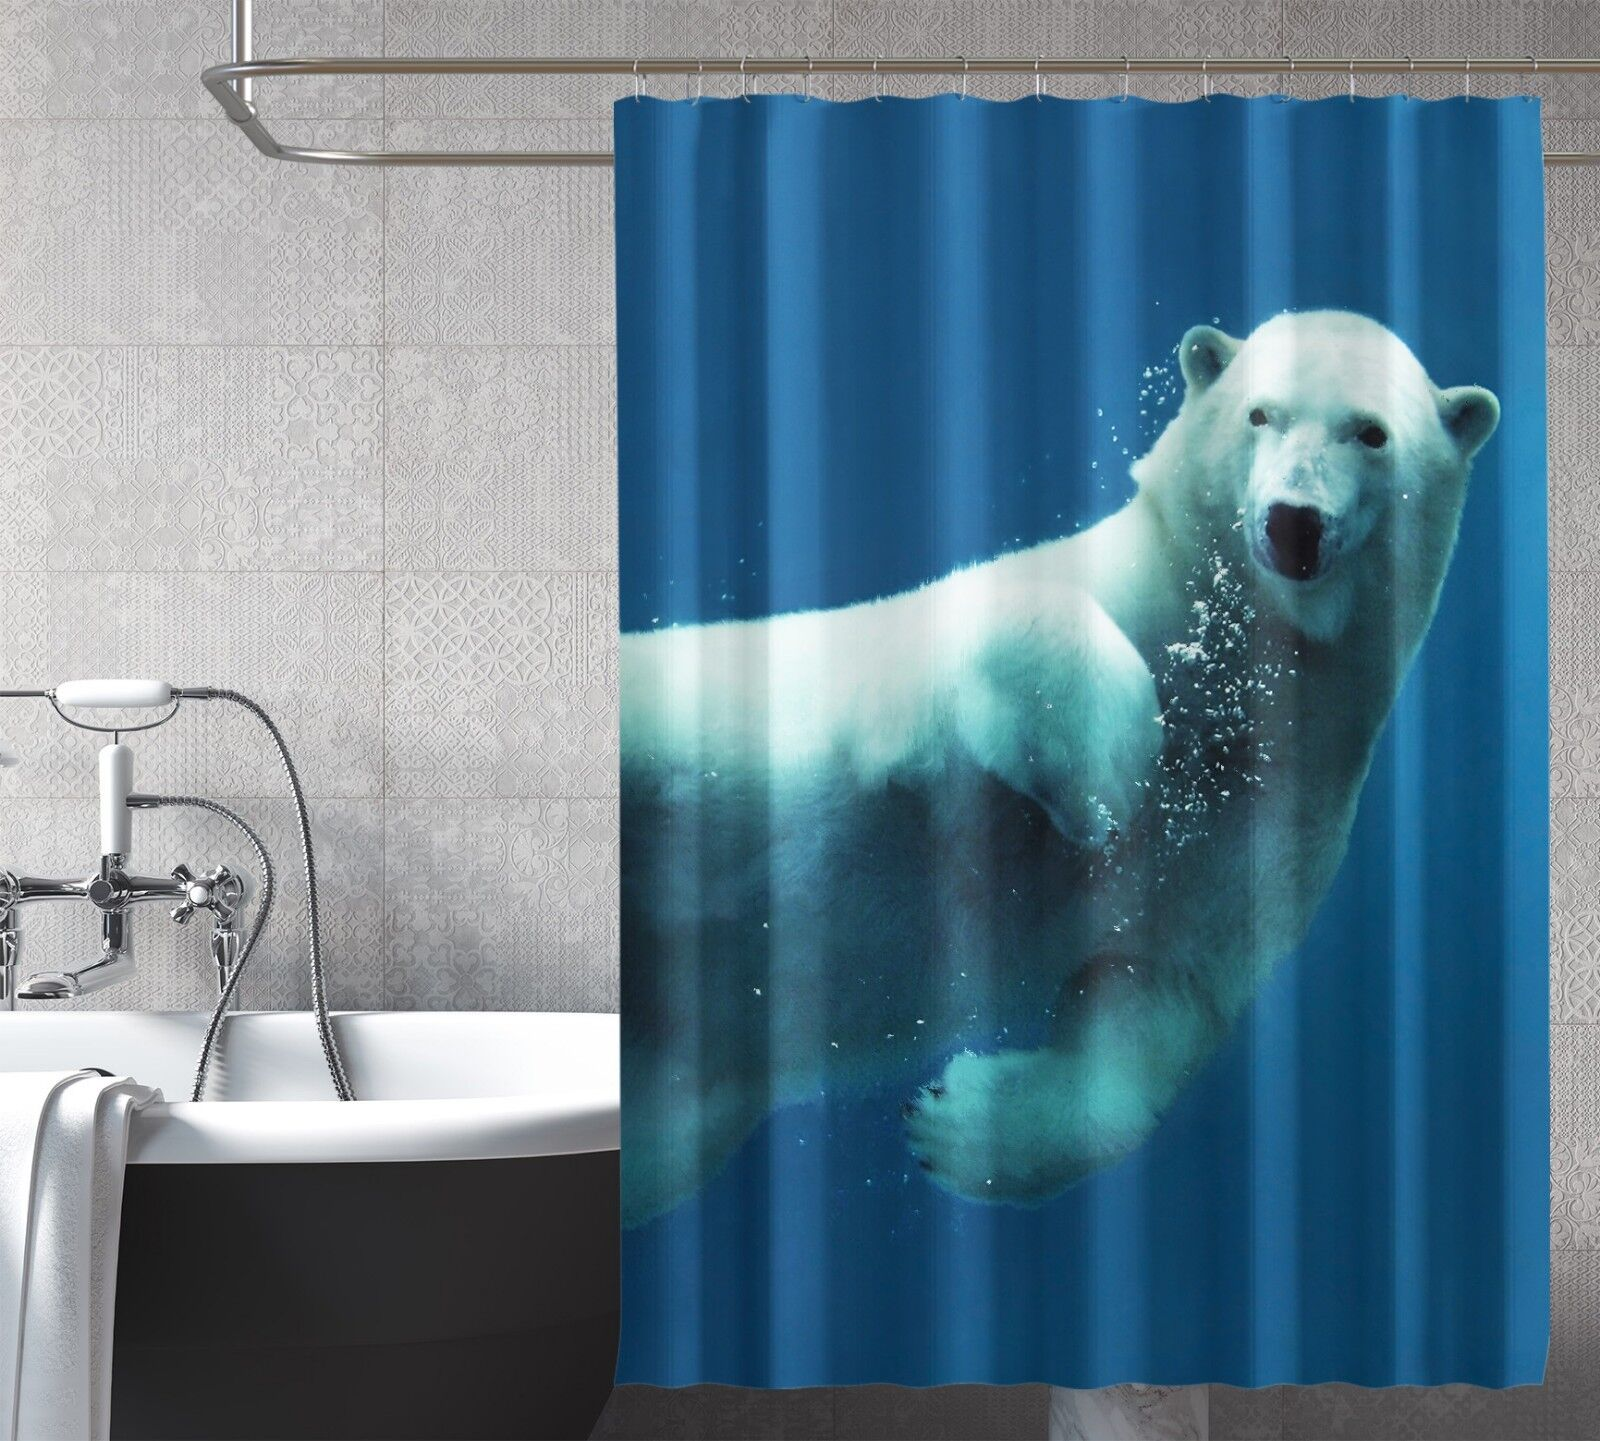 3D Weiß Bear Sea Sea Sea 77 Shower Curtain Waterproof Fiber Bathroom Windows Toilet c4ffea